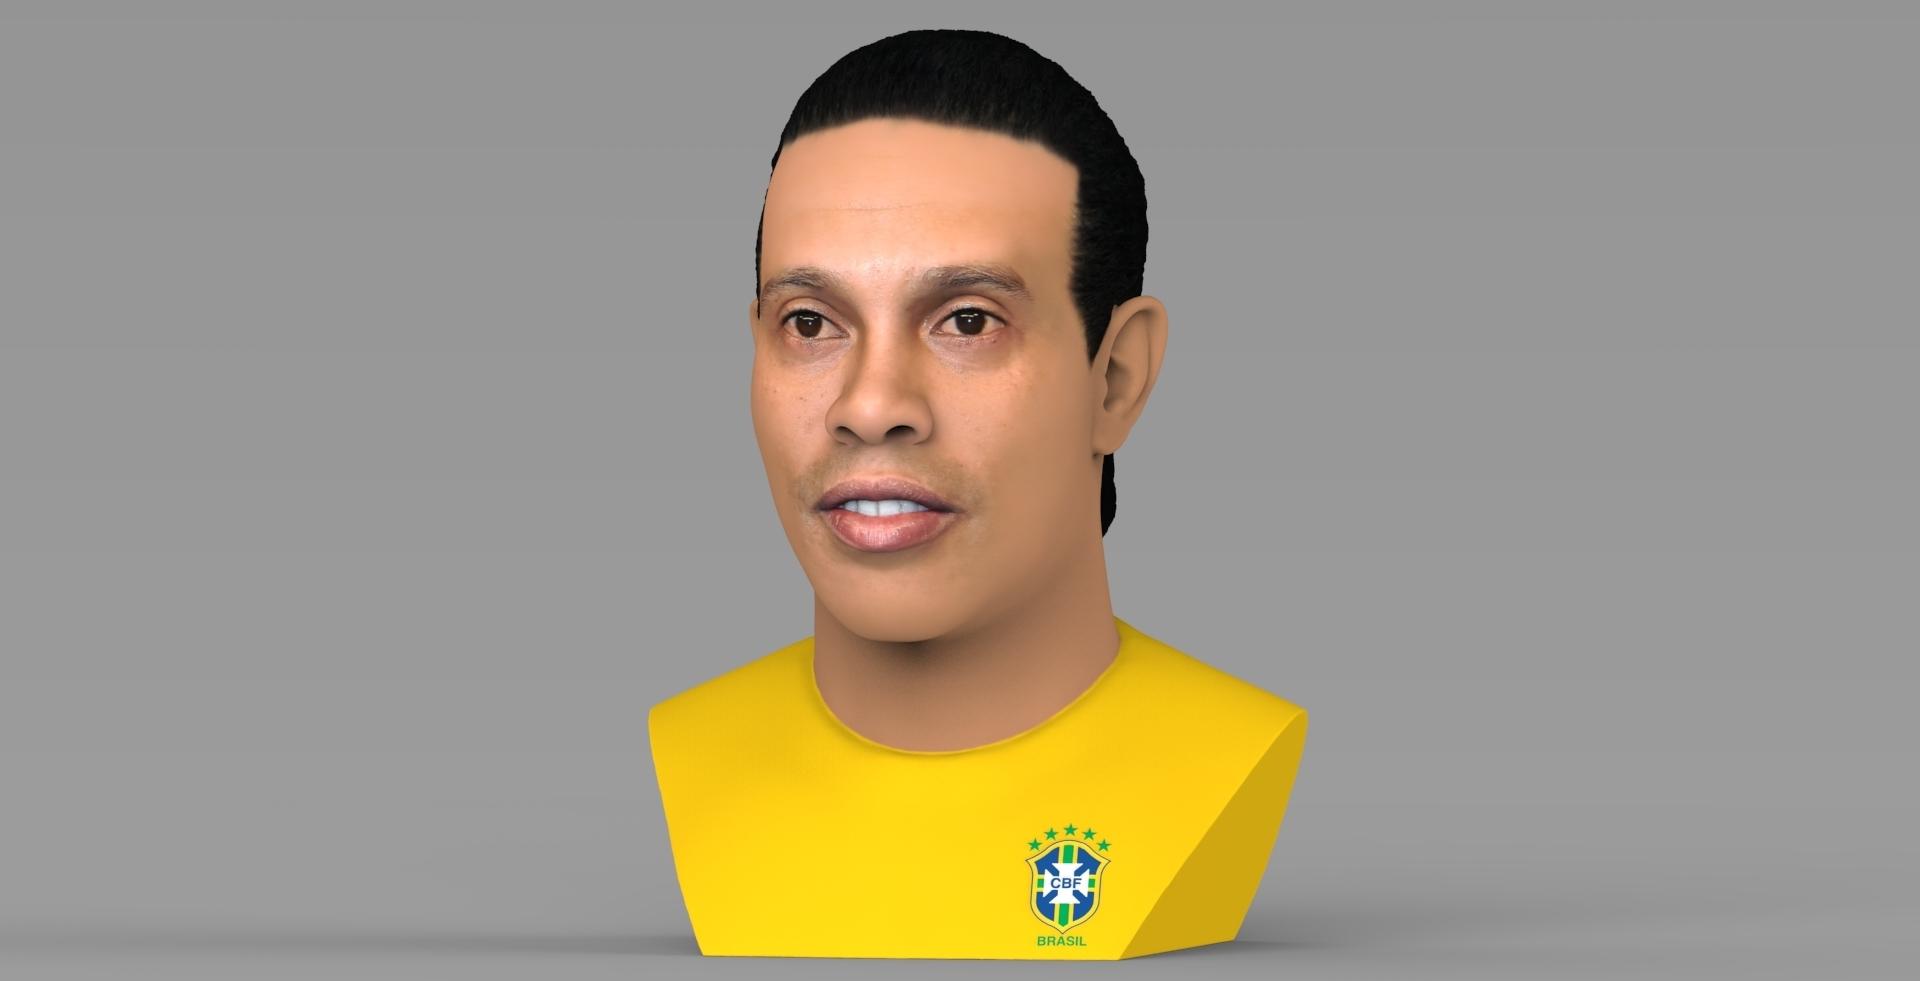 untitled.1680.jpg Download STL file Ronaldinho bust ready for full color 3D printing • 3D print model, PrintedReality